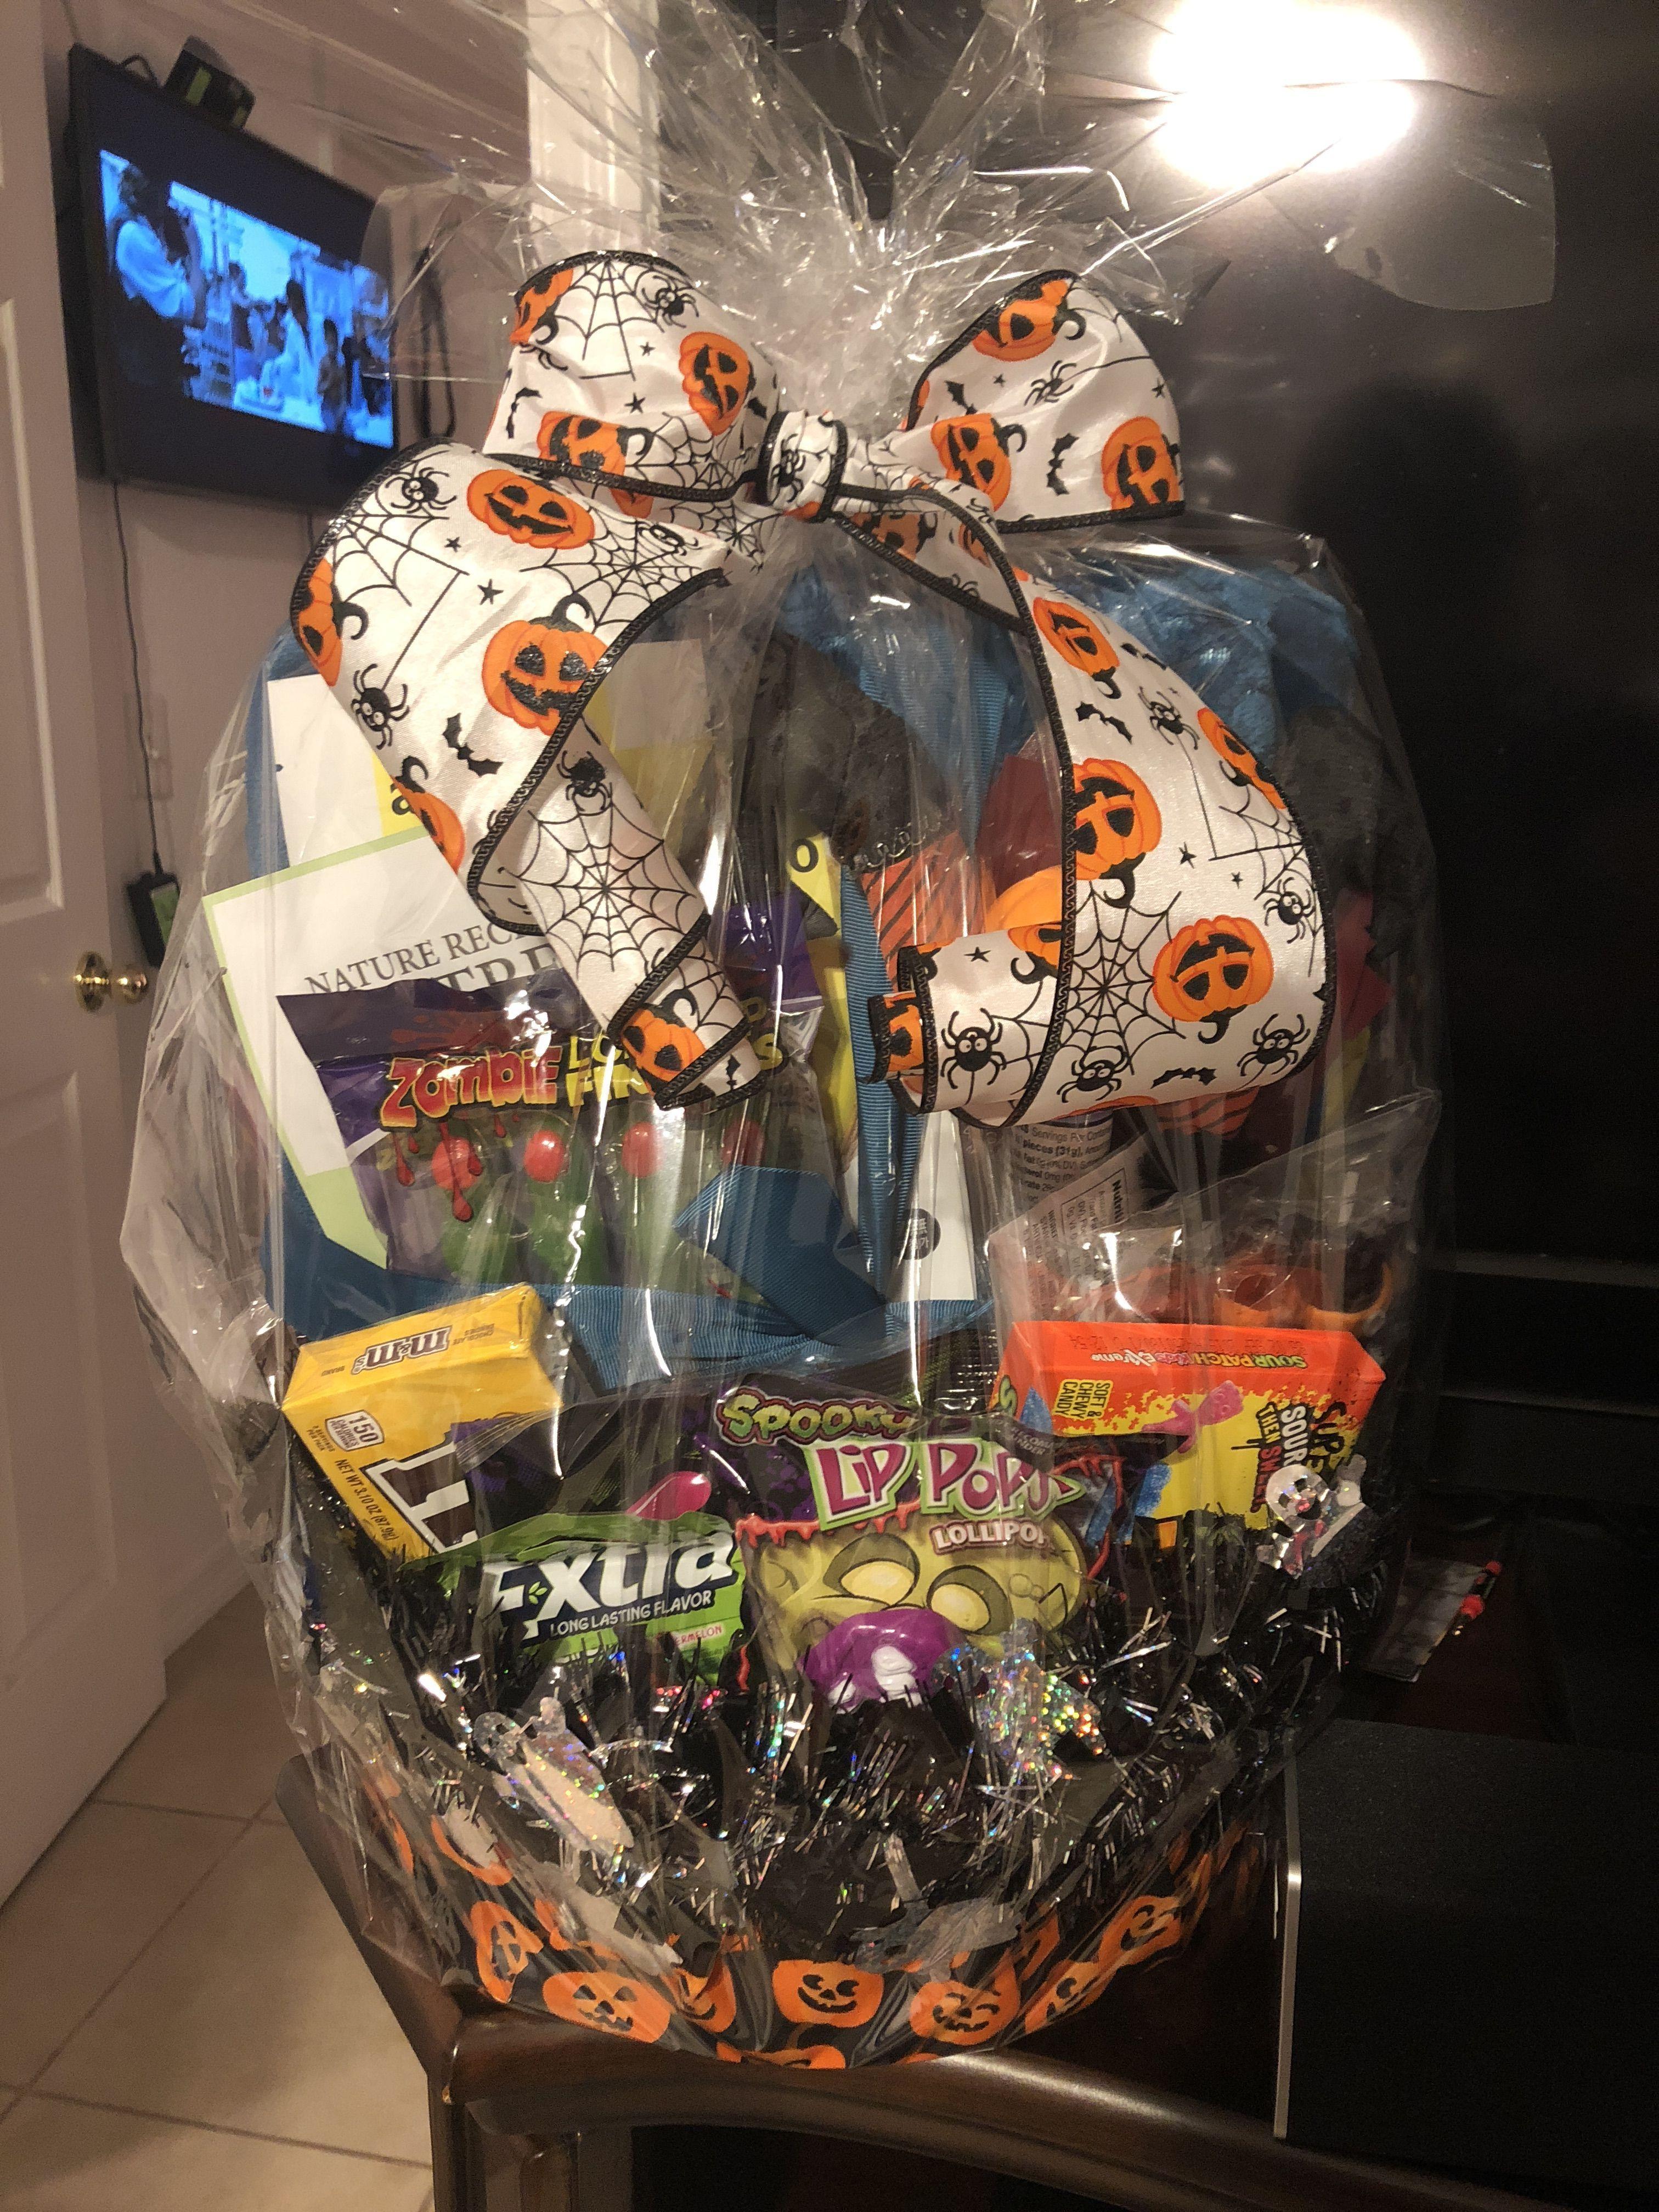 Spooky basket #spookybasket Spooky basket #spookybasket Spooky basket #spookybasket Spooky basket #spookybasket